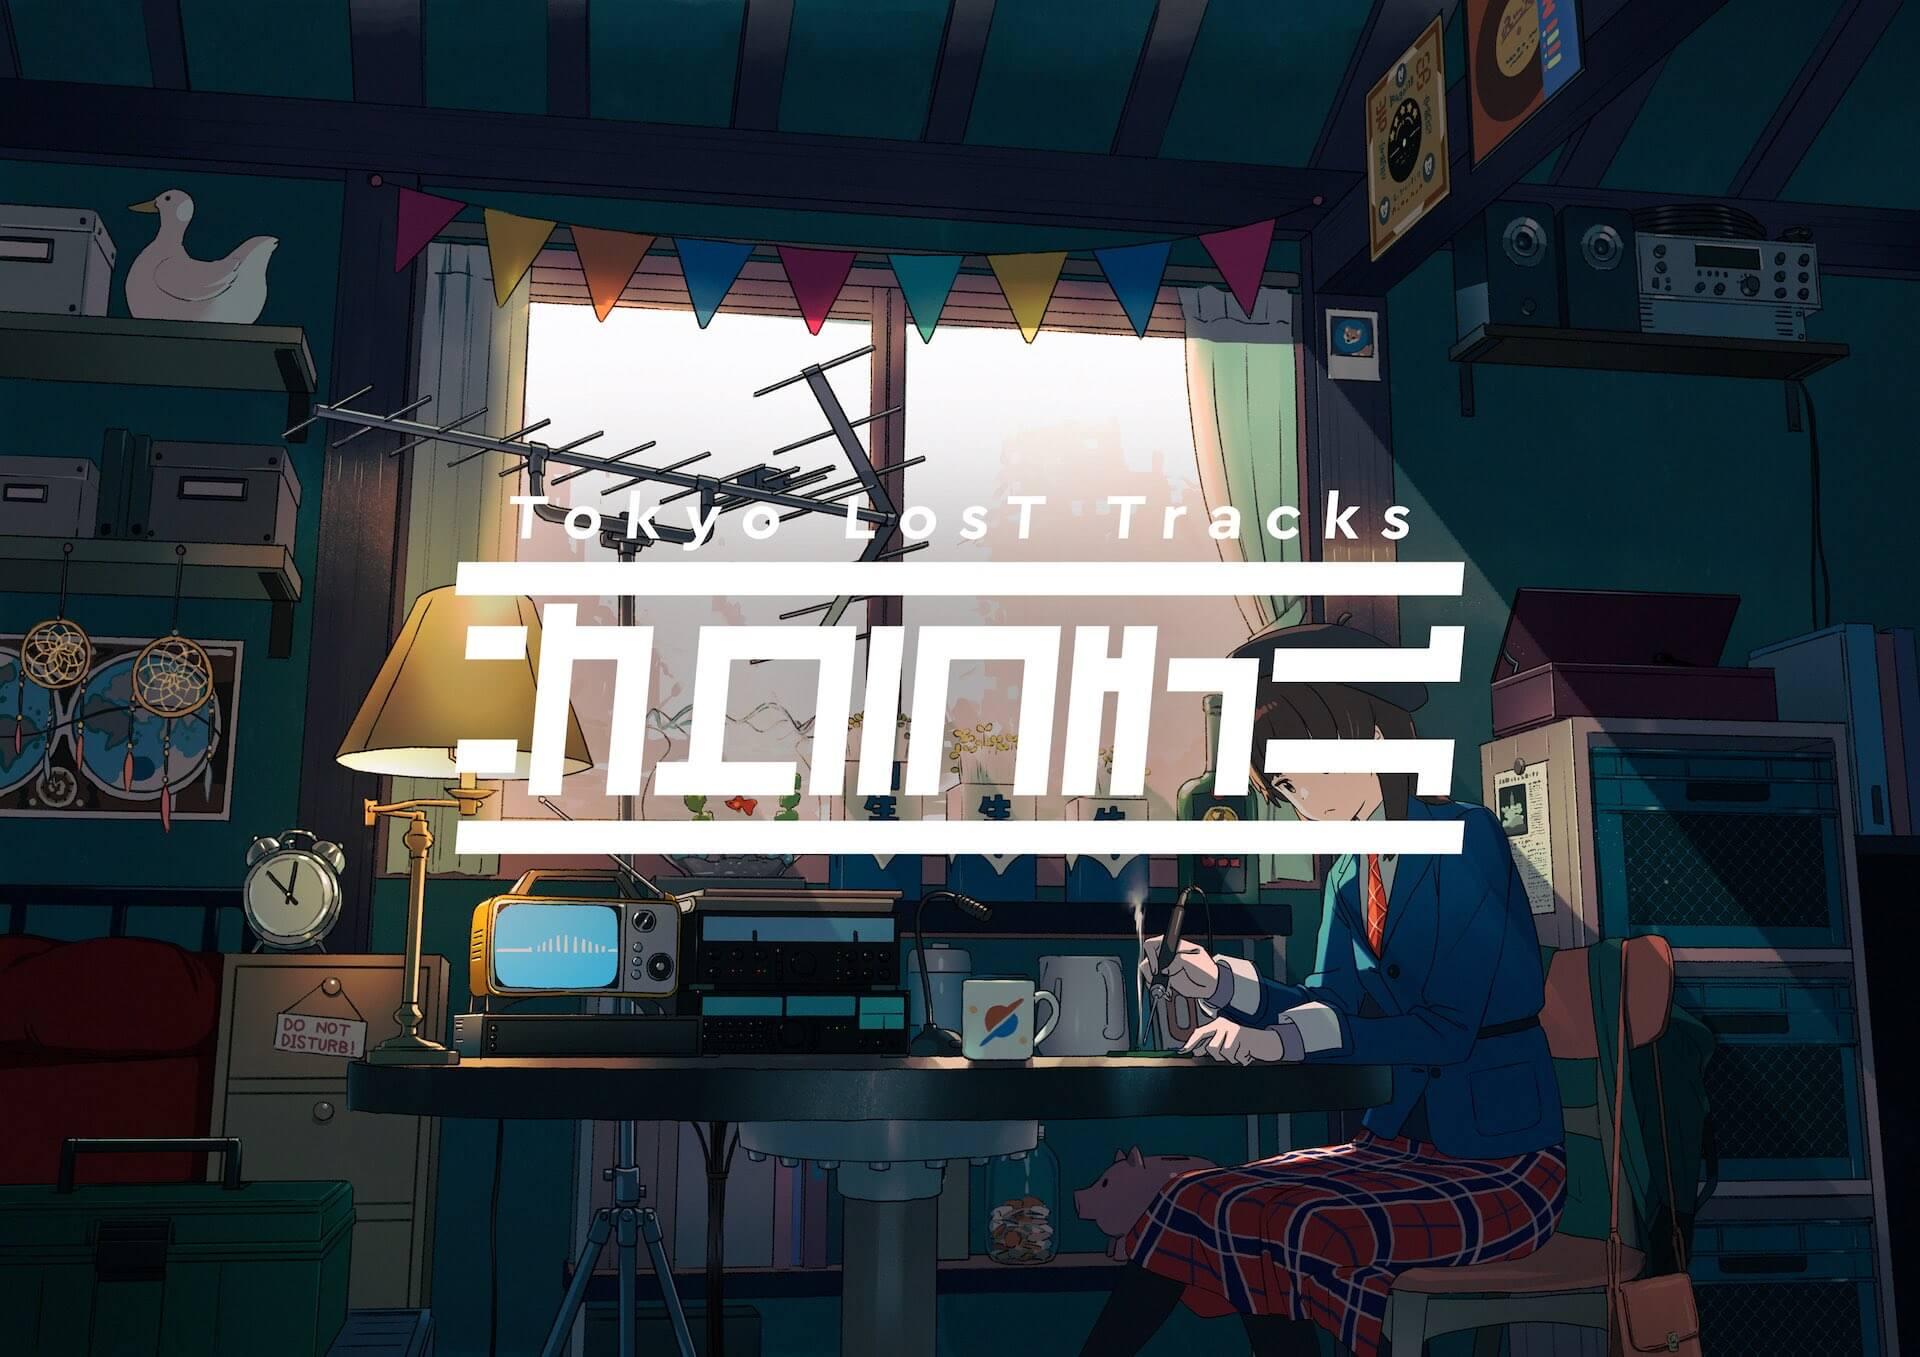 Lo-Fi Beatsチャンネル「Tokyo LosT Tracks -サクラチル-」にDJ Mitsu the Beatsの書き下ろし新曲が追加! music200422_tokyolosttracks_02